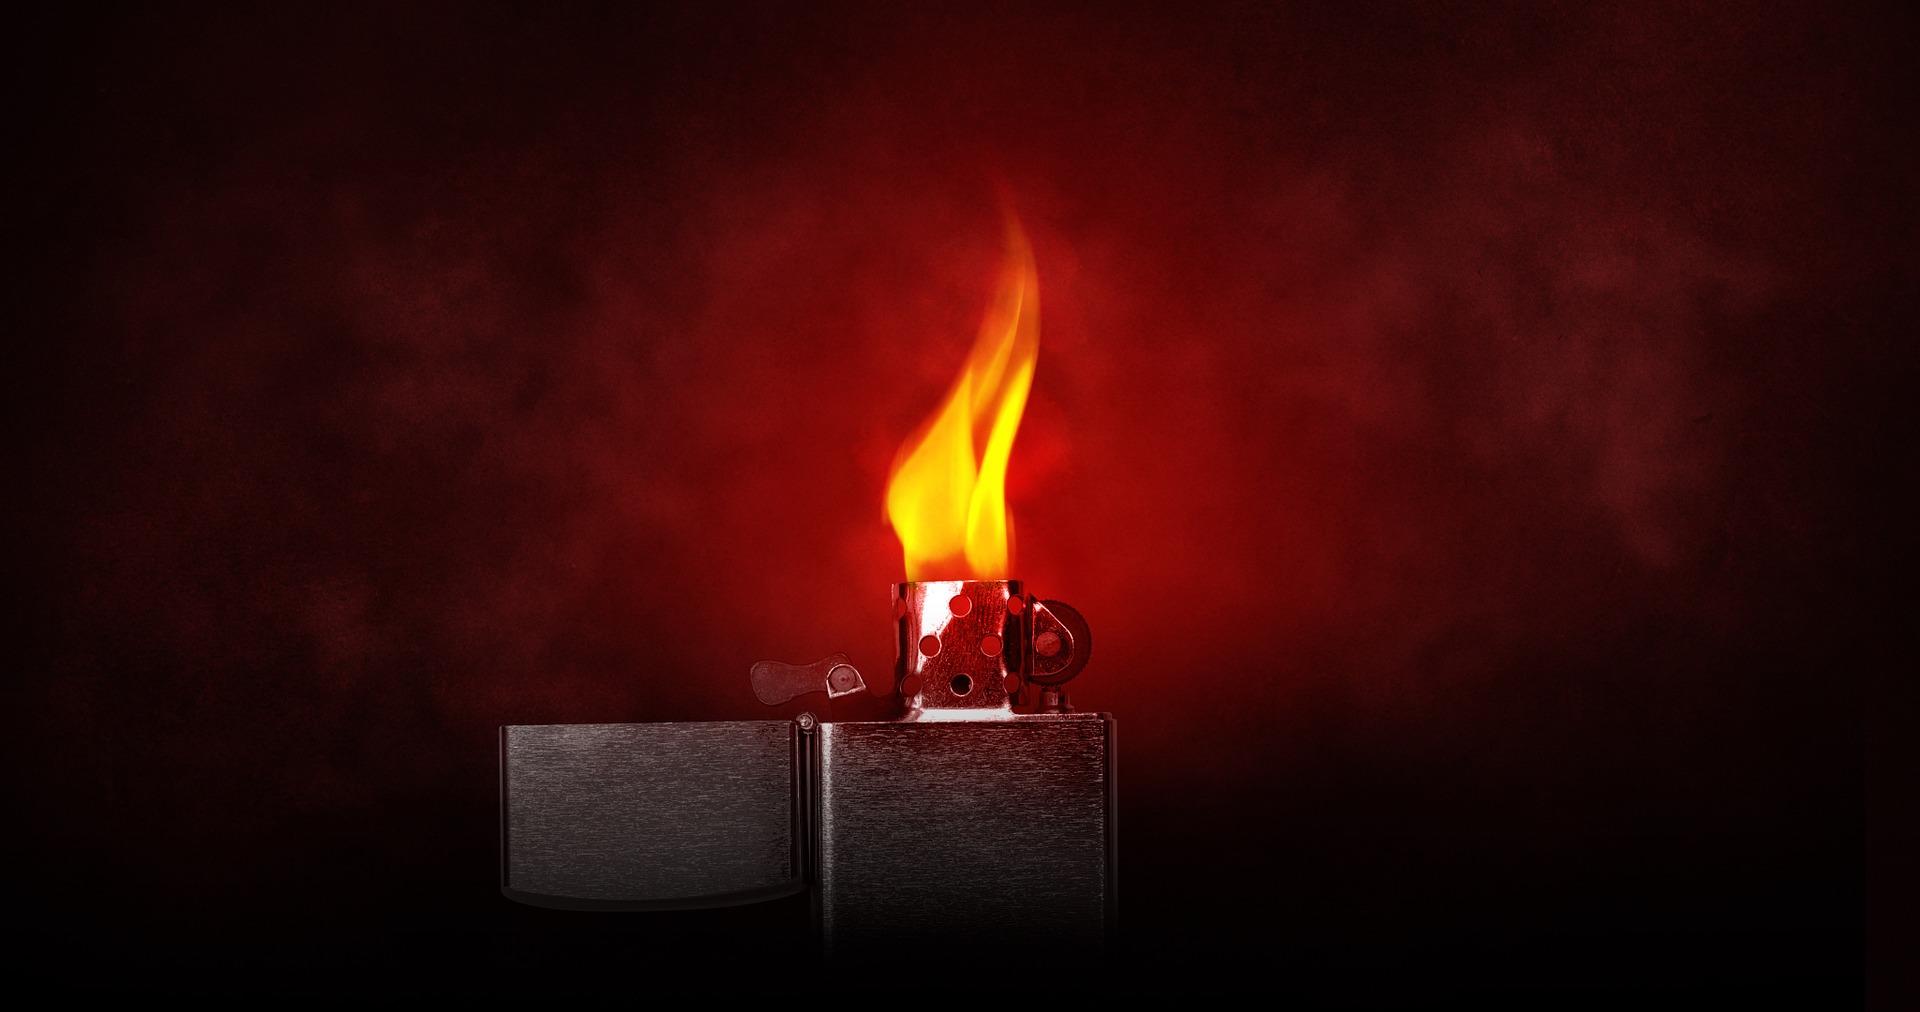 encendedor, mechero, llama, fuego, calor, zippo - Fondos de Pantalla HD - professor-falken.com